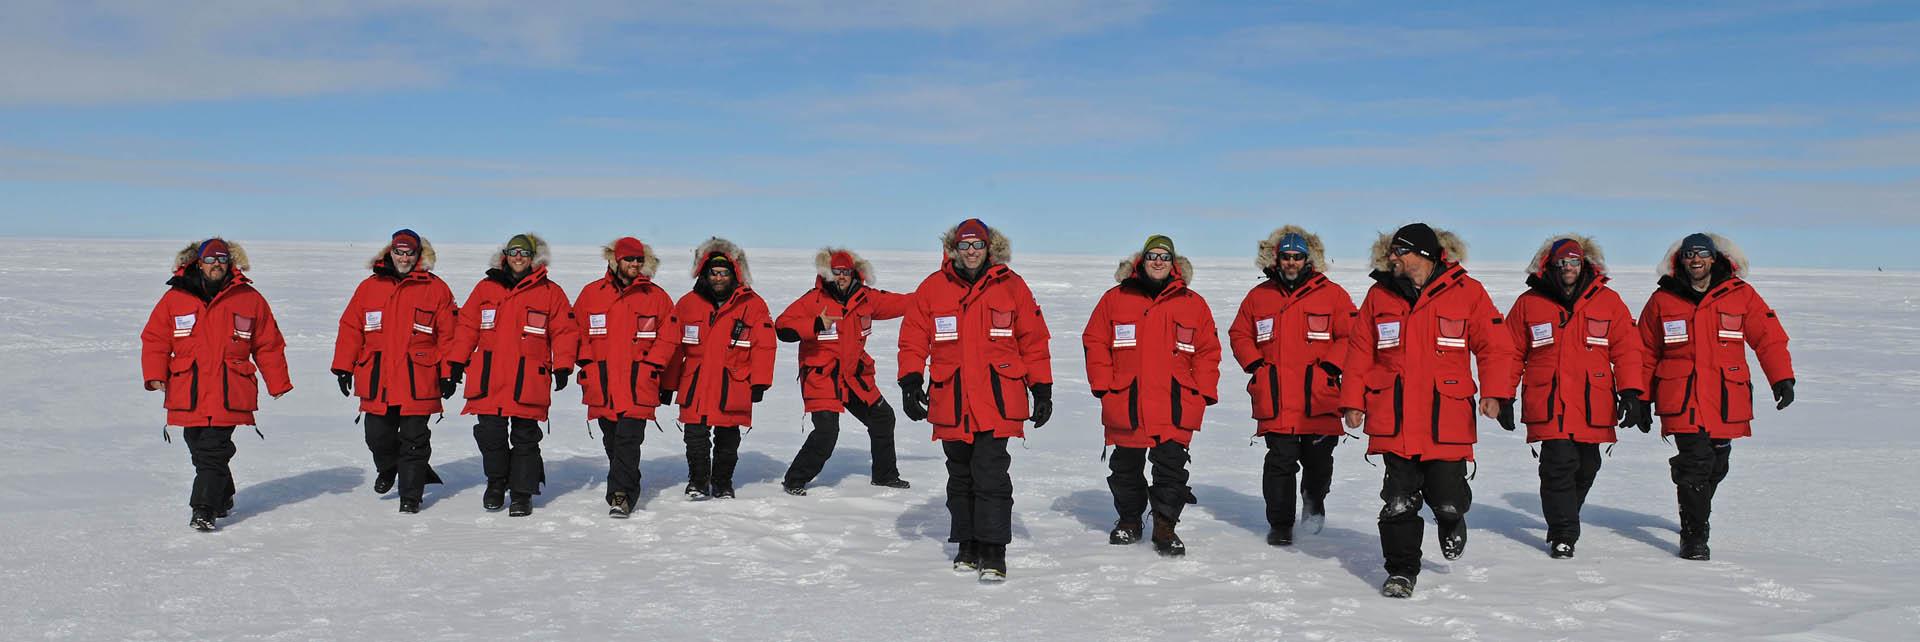 SLE deep field team. canada goose logo antarctica .